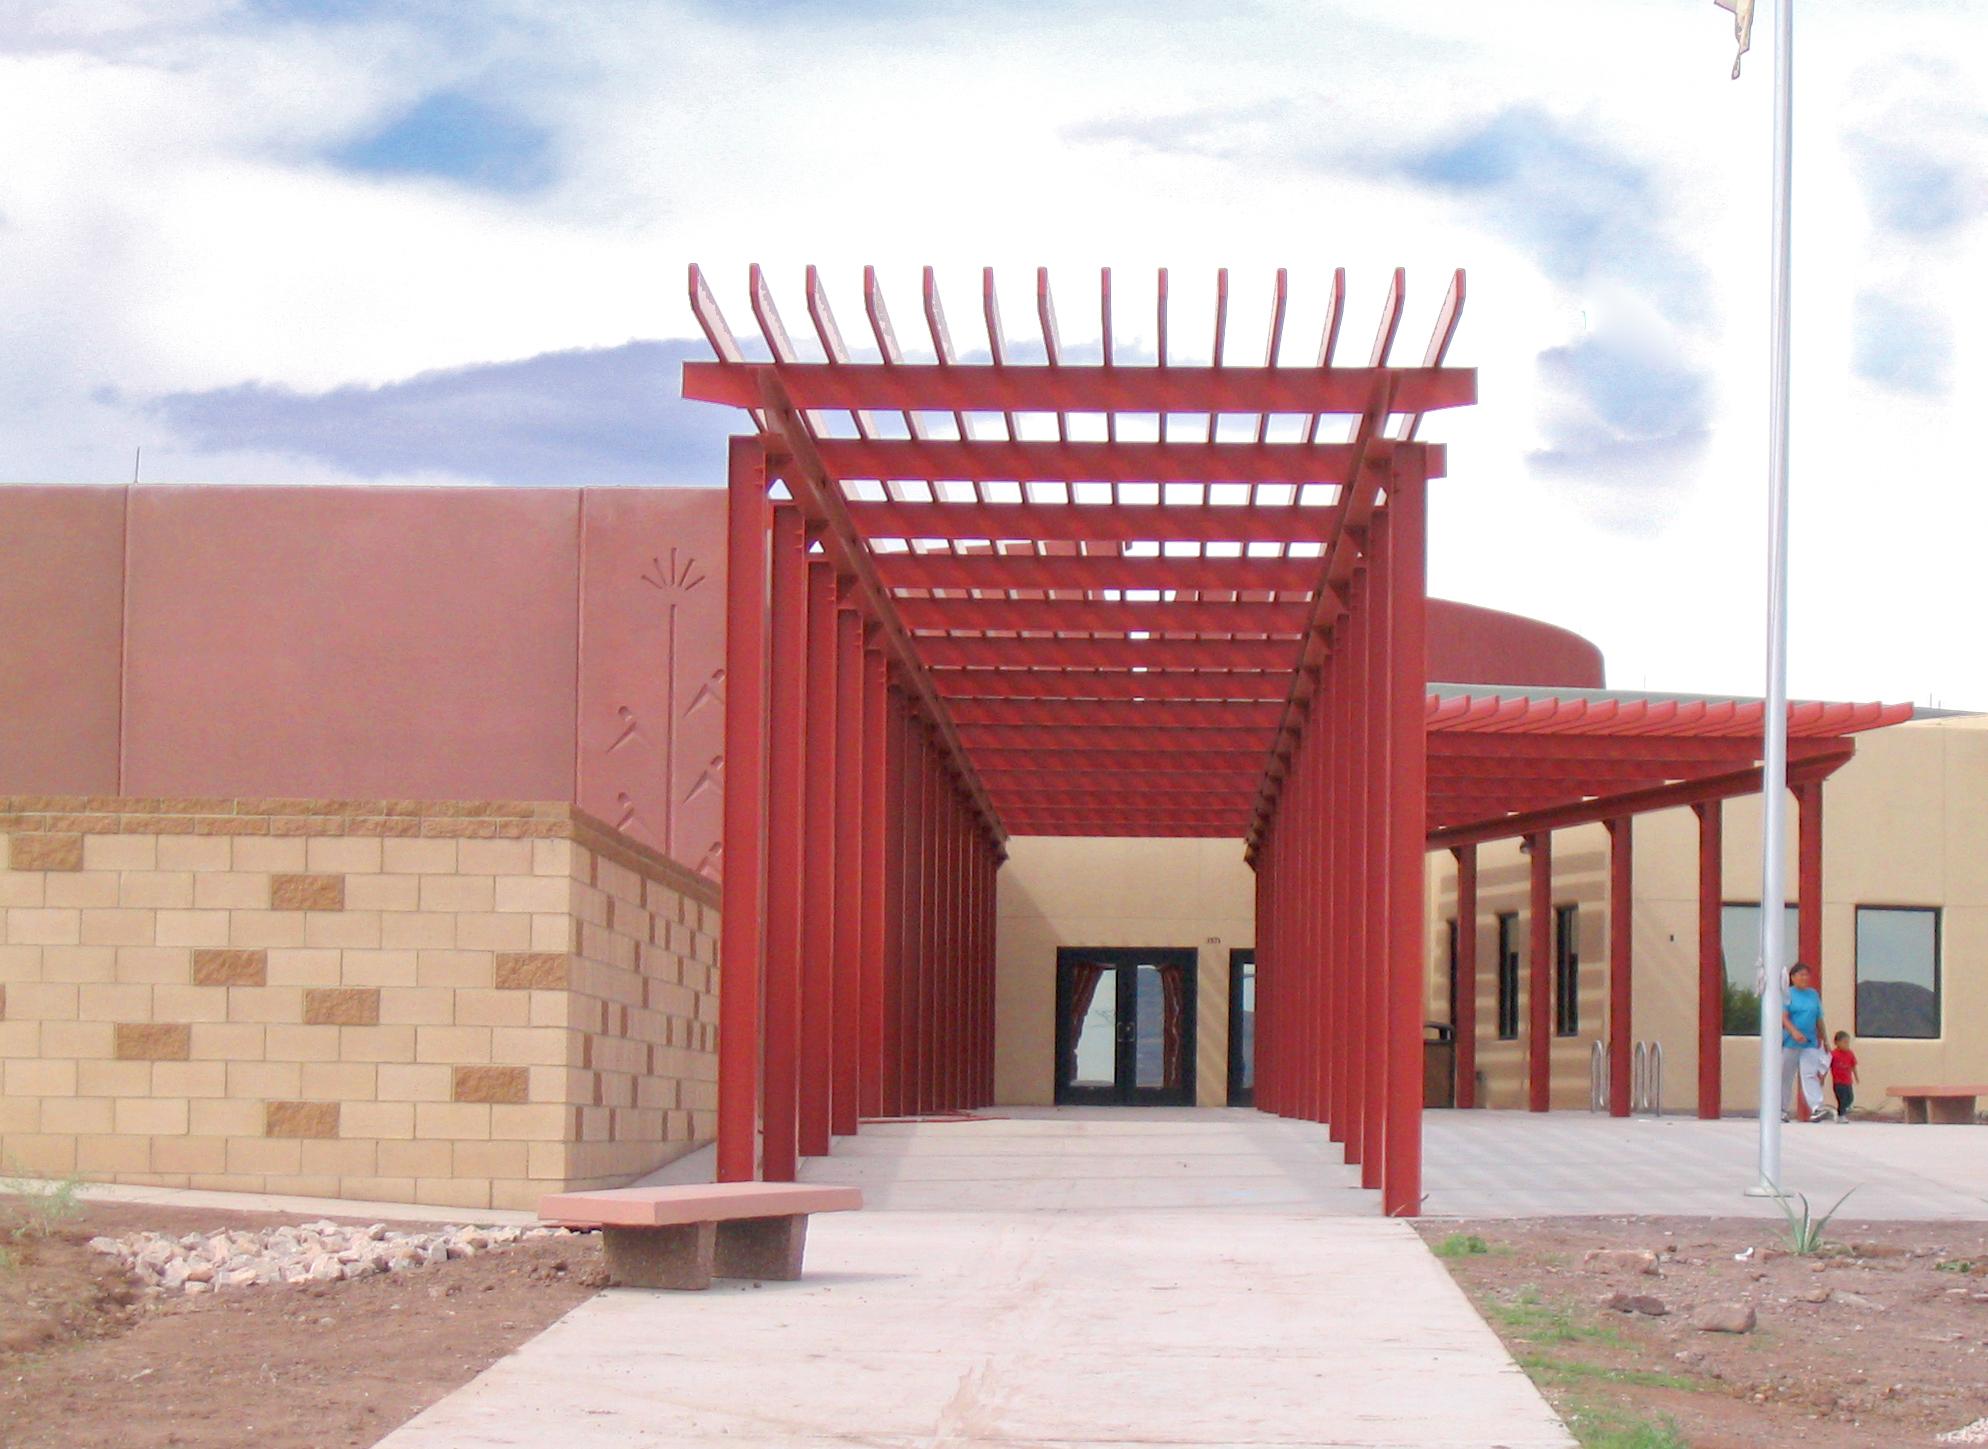 Baca Dlo'ay Azhi Community School